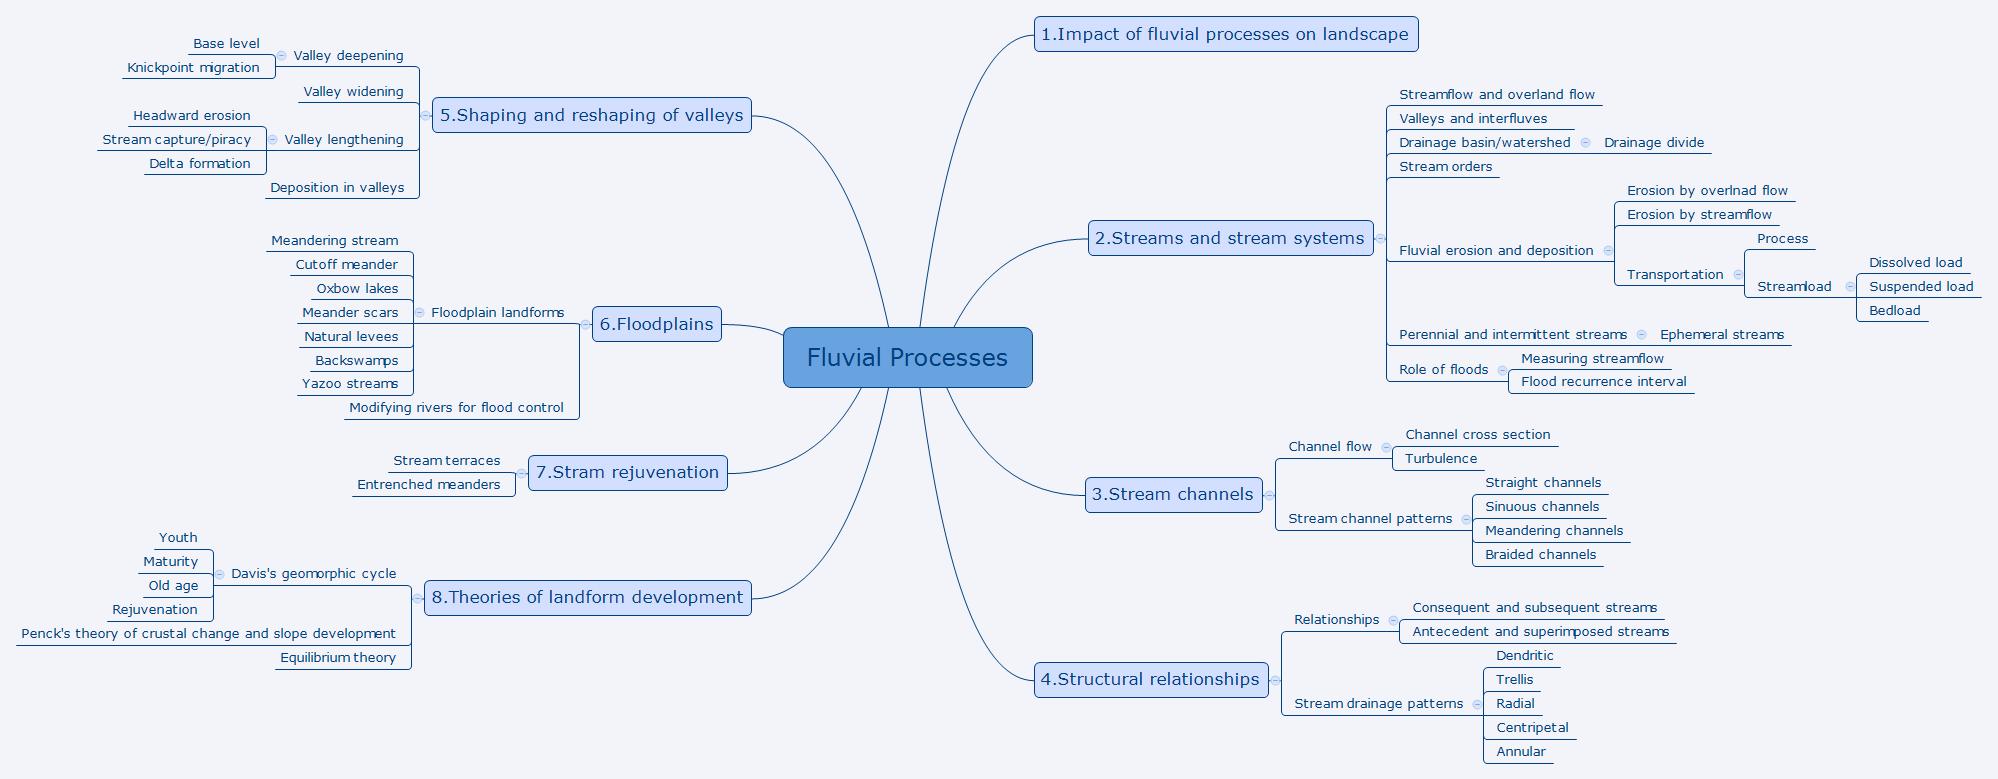 Fluvial Processes